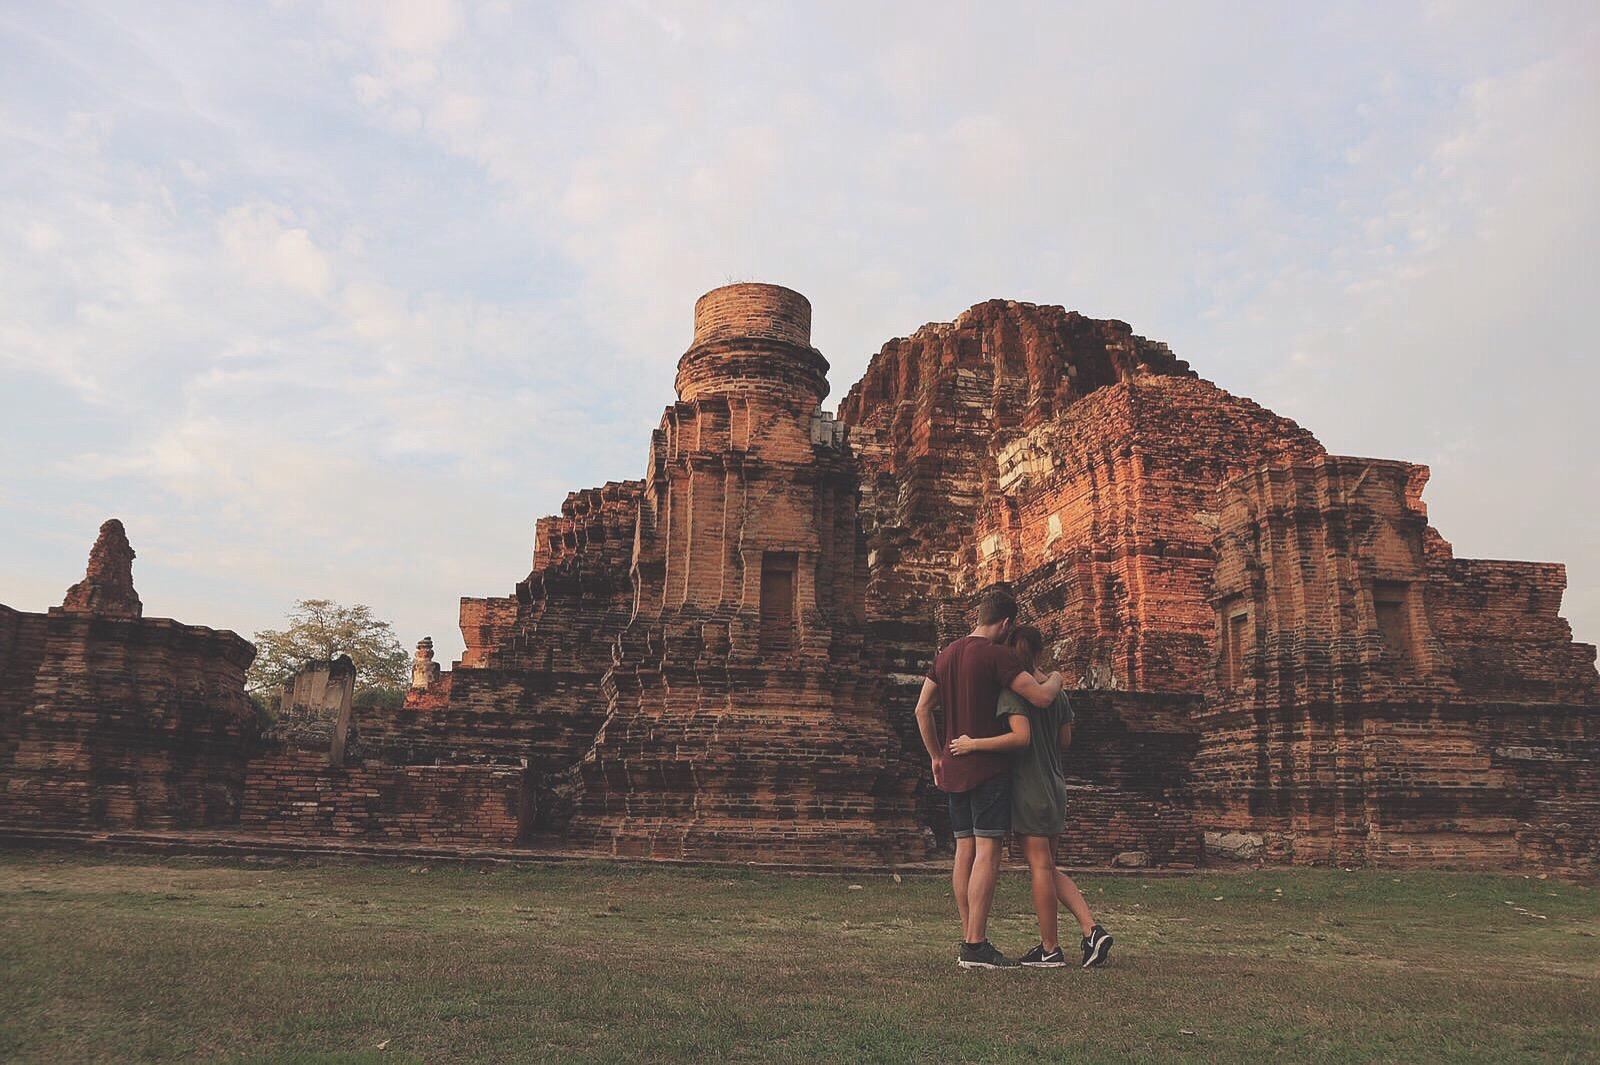 Bangkok, Ayutthaya, travel, wanderlust, couple, backpack, lifestyle, world, earth, fitfam, fitdutchies, goals, beach, sun, fun